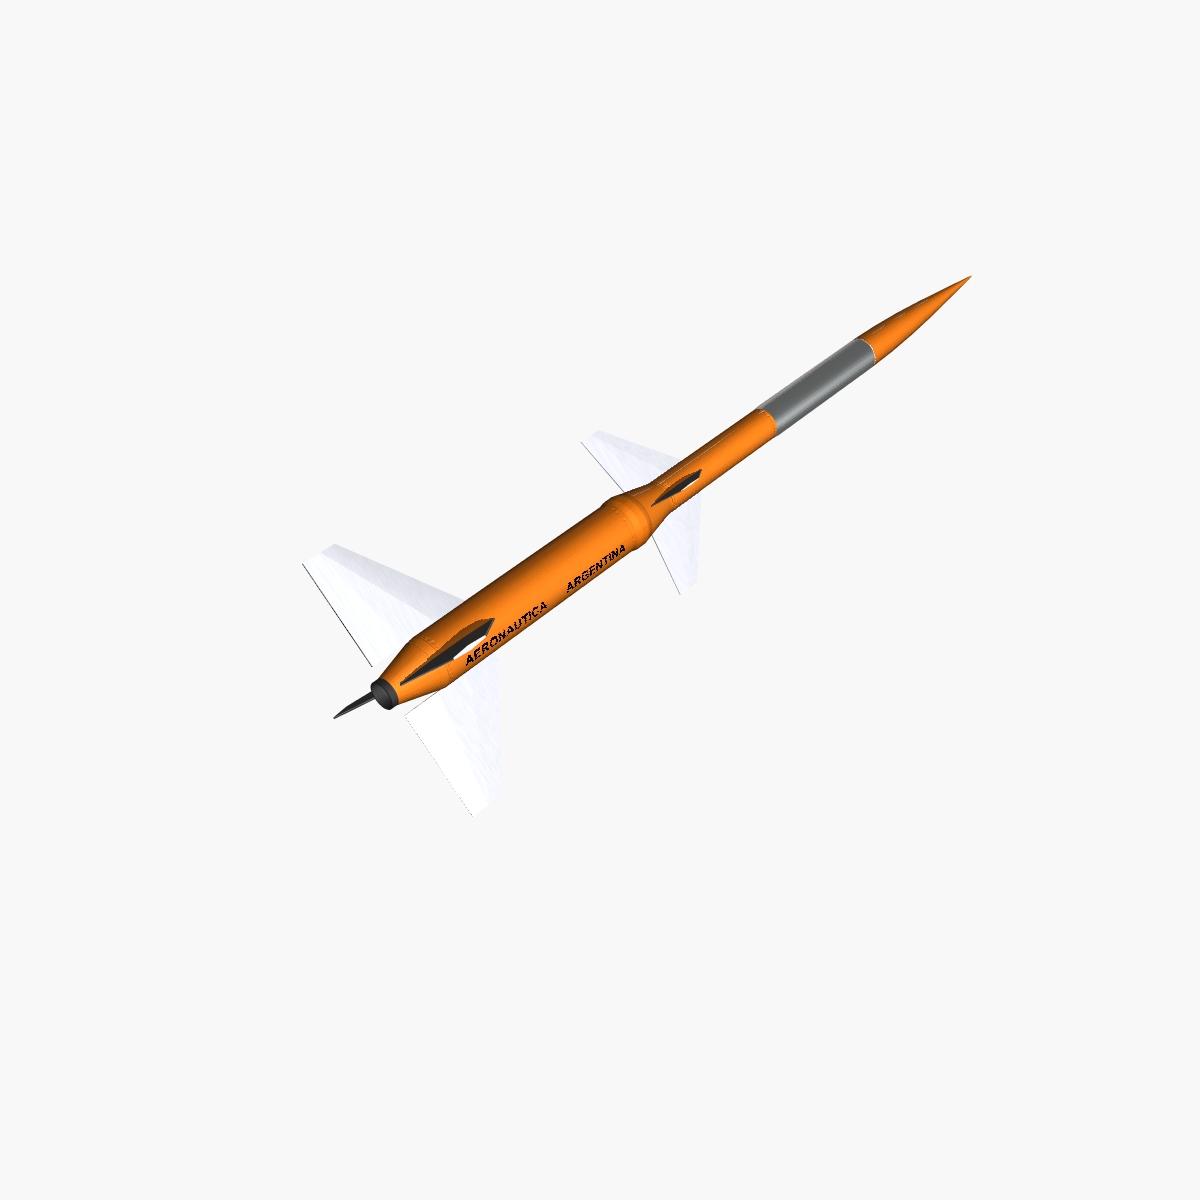 gamma centauro rocket 3d model 3ds dxf fbx blend cob dae x obj 218201